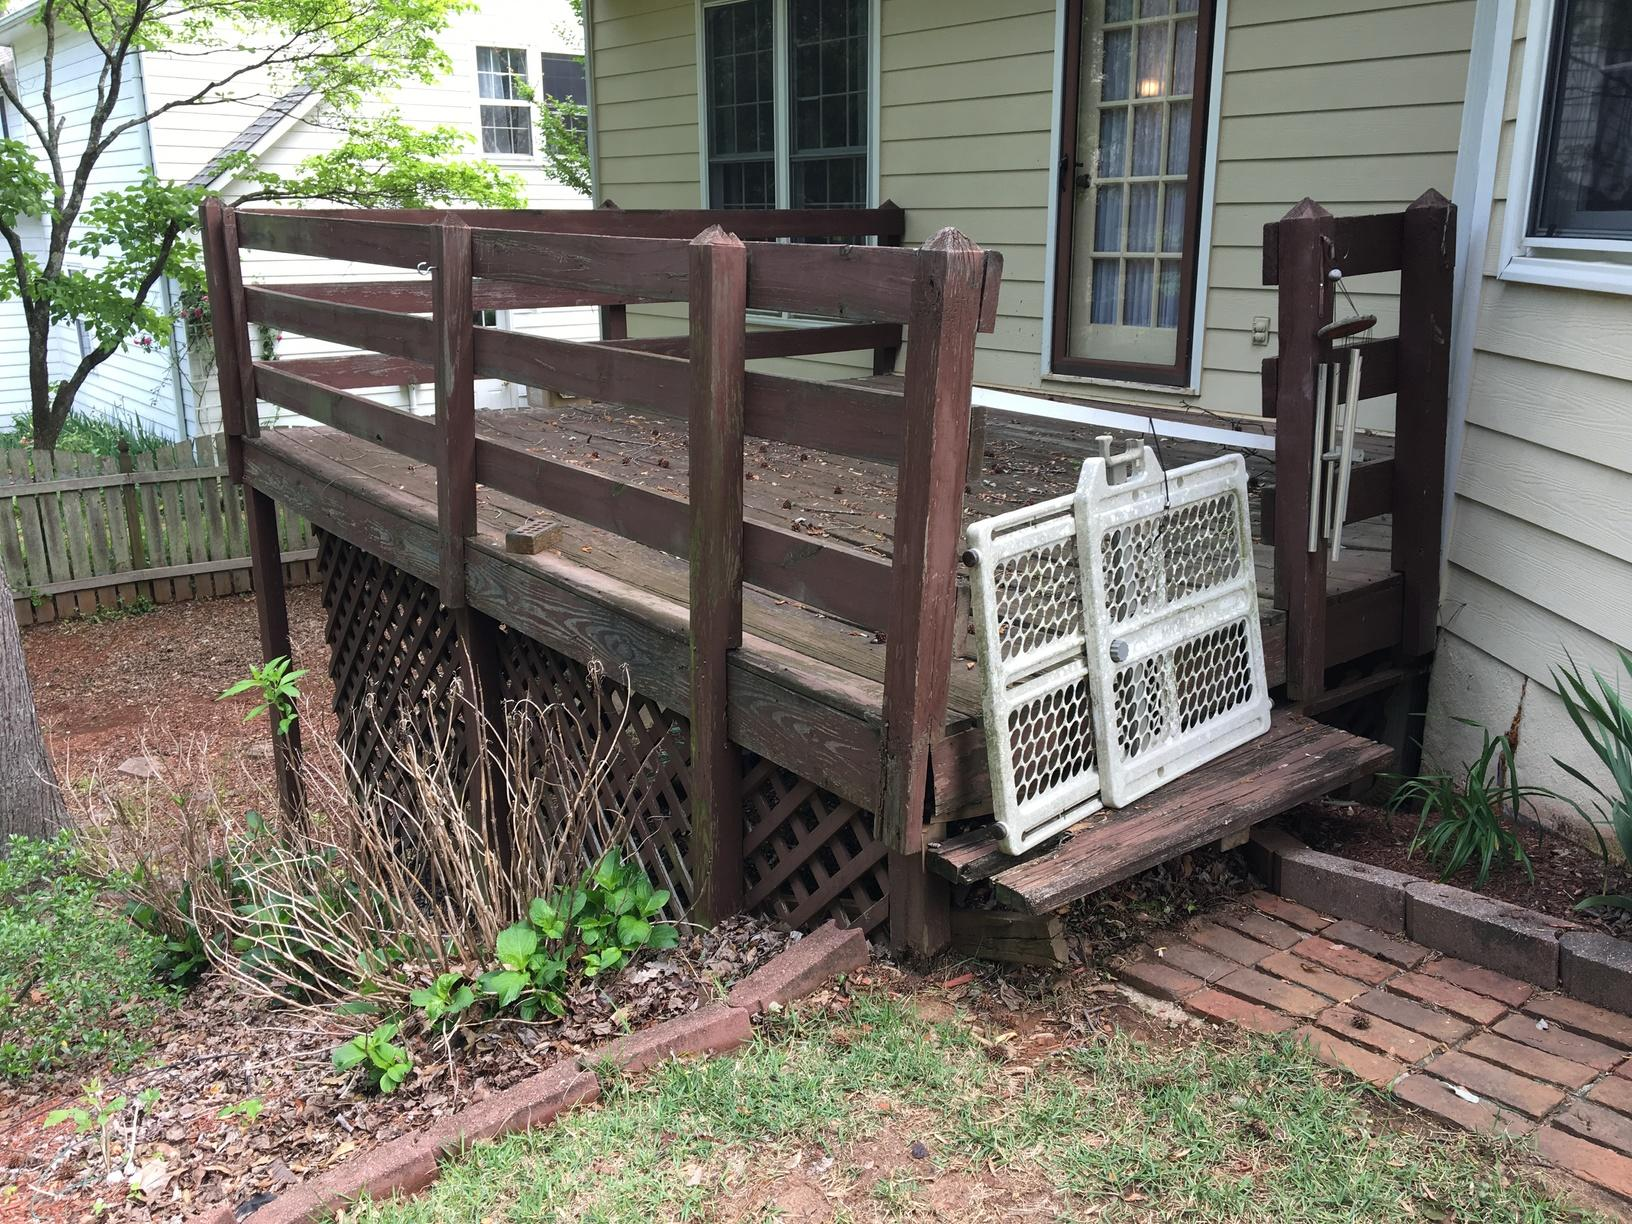 New Deck and Pergola Installed in Marietta, GA - Before Photo